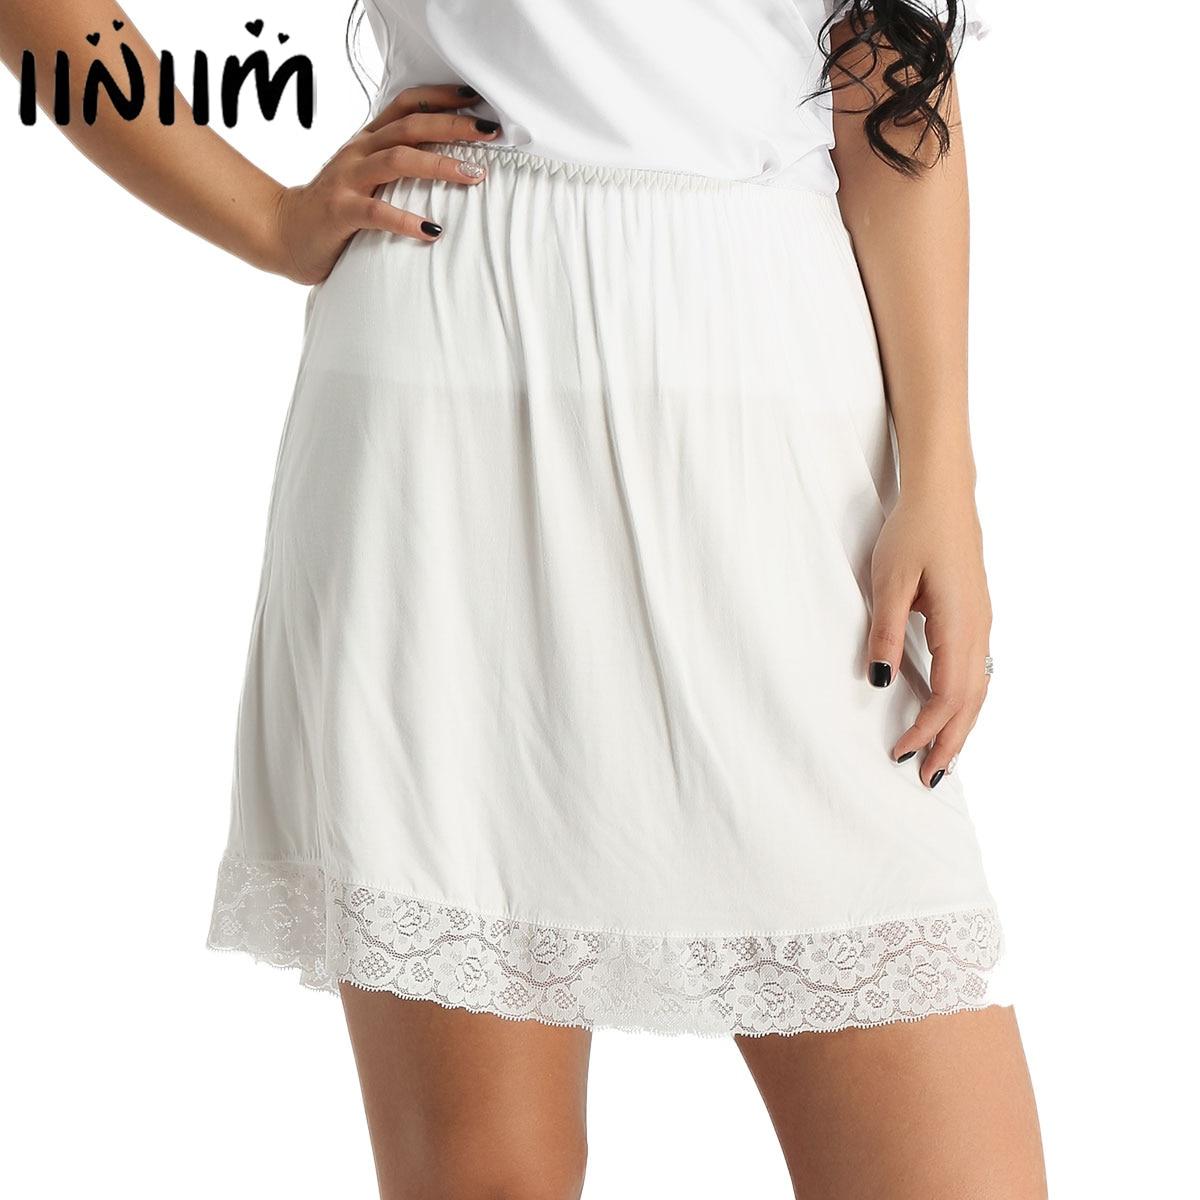 Iiniim Women Vintage Soft Mini Underskirt Lace Skirt Extender Half Slip Layered Under Skirt For Femme Wedding Cocktail Party